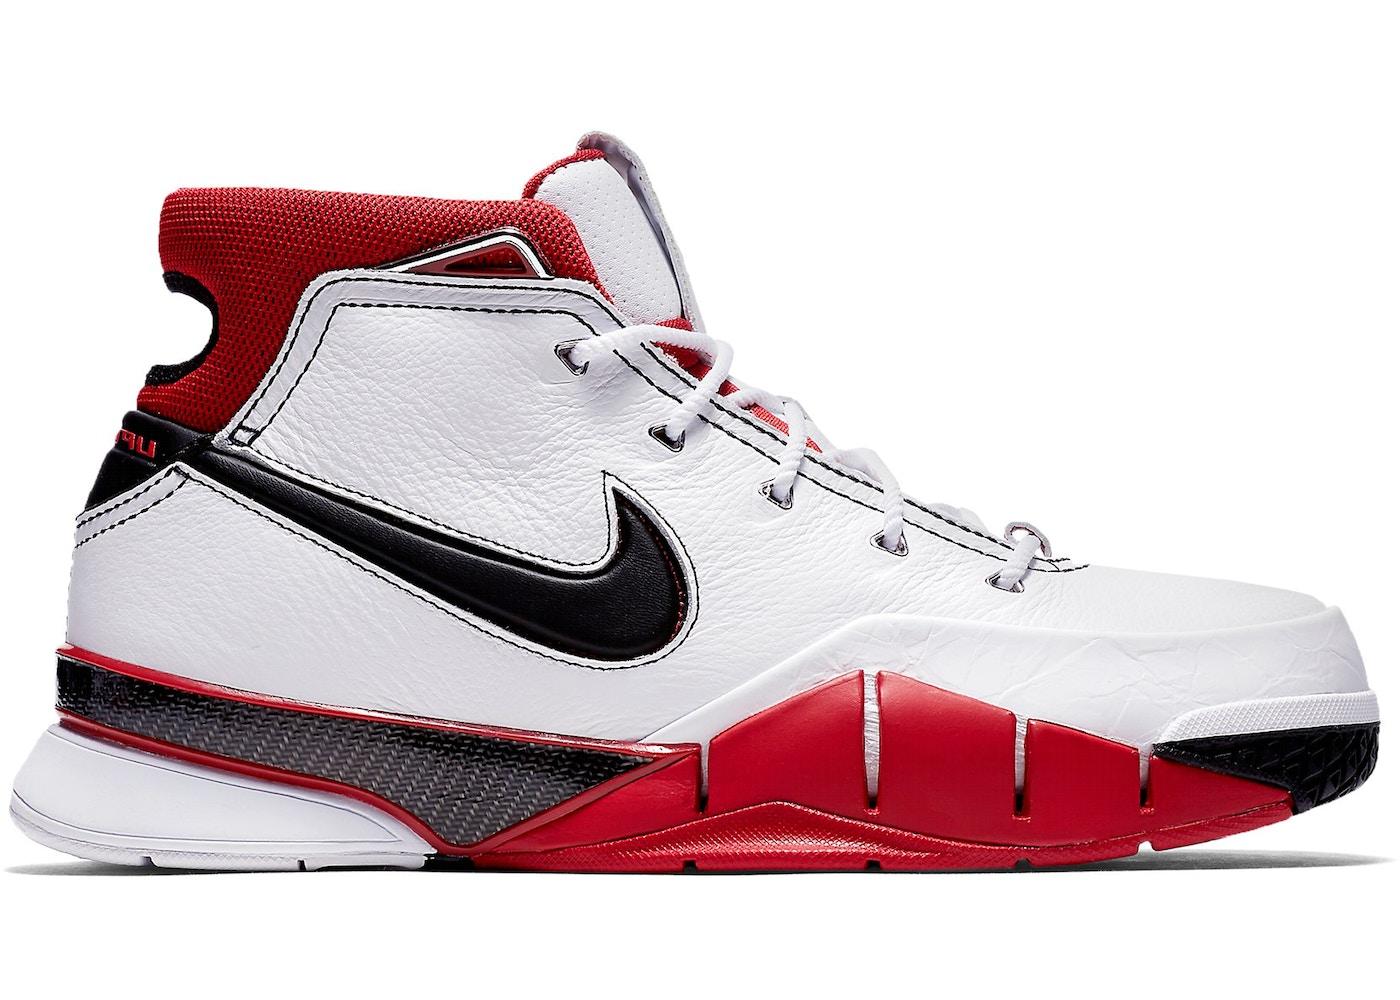 97+ Nike Kobe Ad White Silver 852427 110 Sole Collector. Kobe A D ... a9ccea6c4